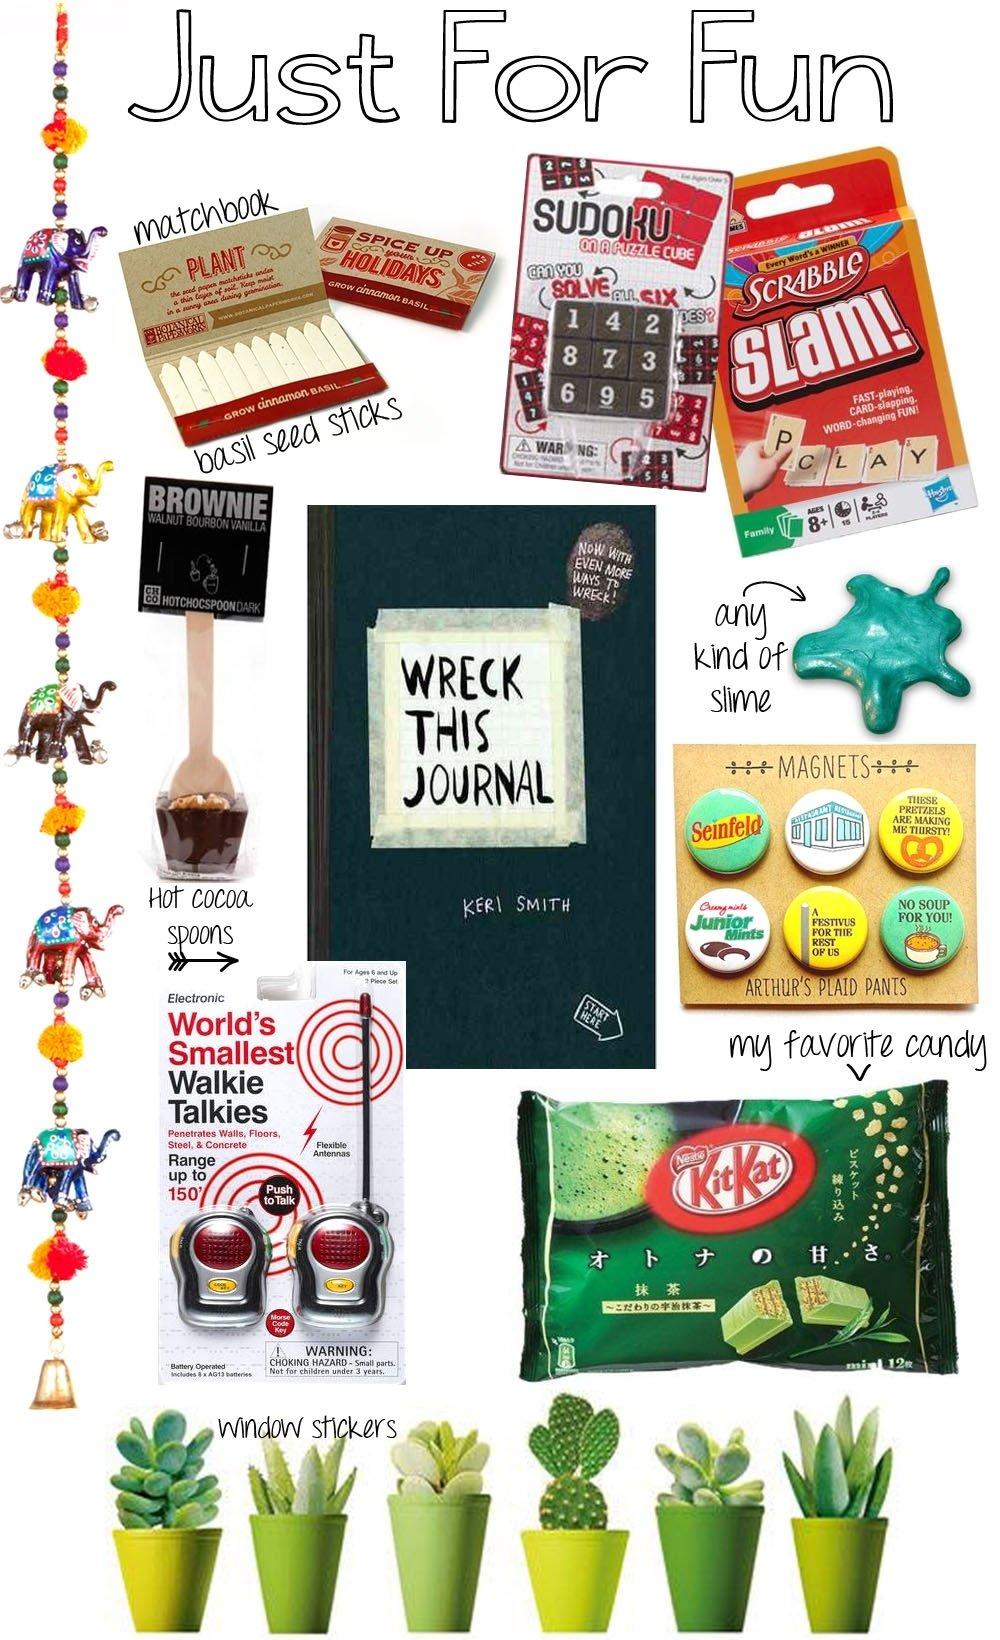 10 Stunning Stocking Stuffer Ideas For Women stocking stuffers for her making mondays 8 2021